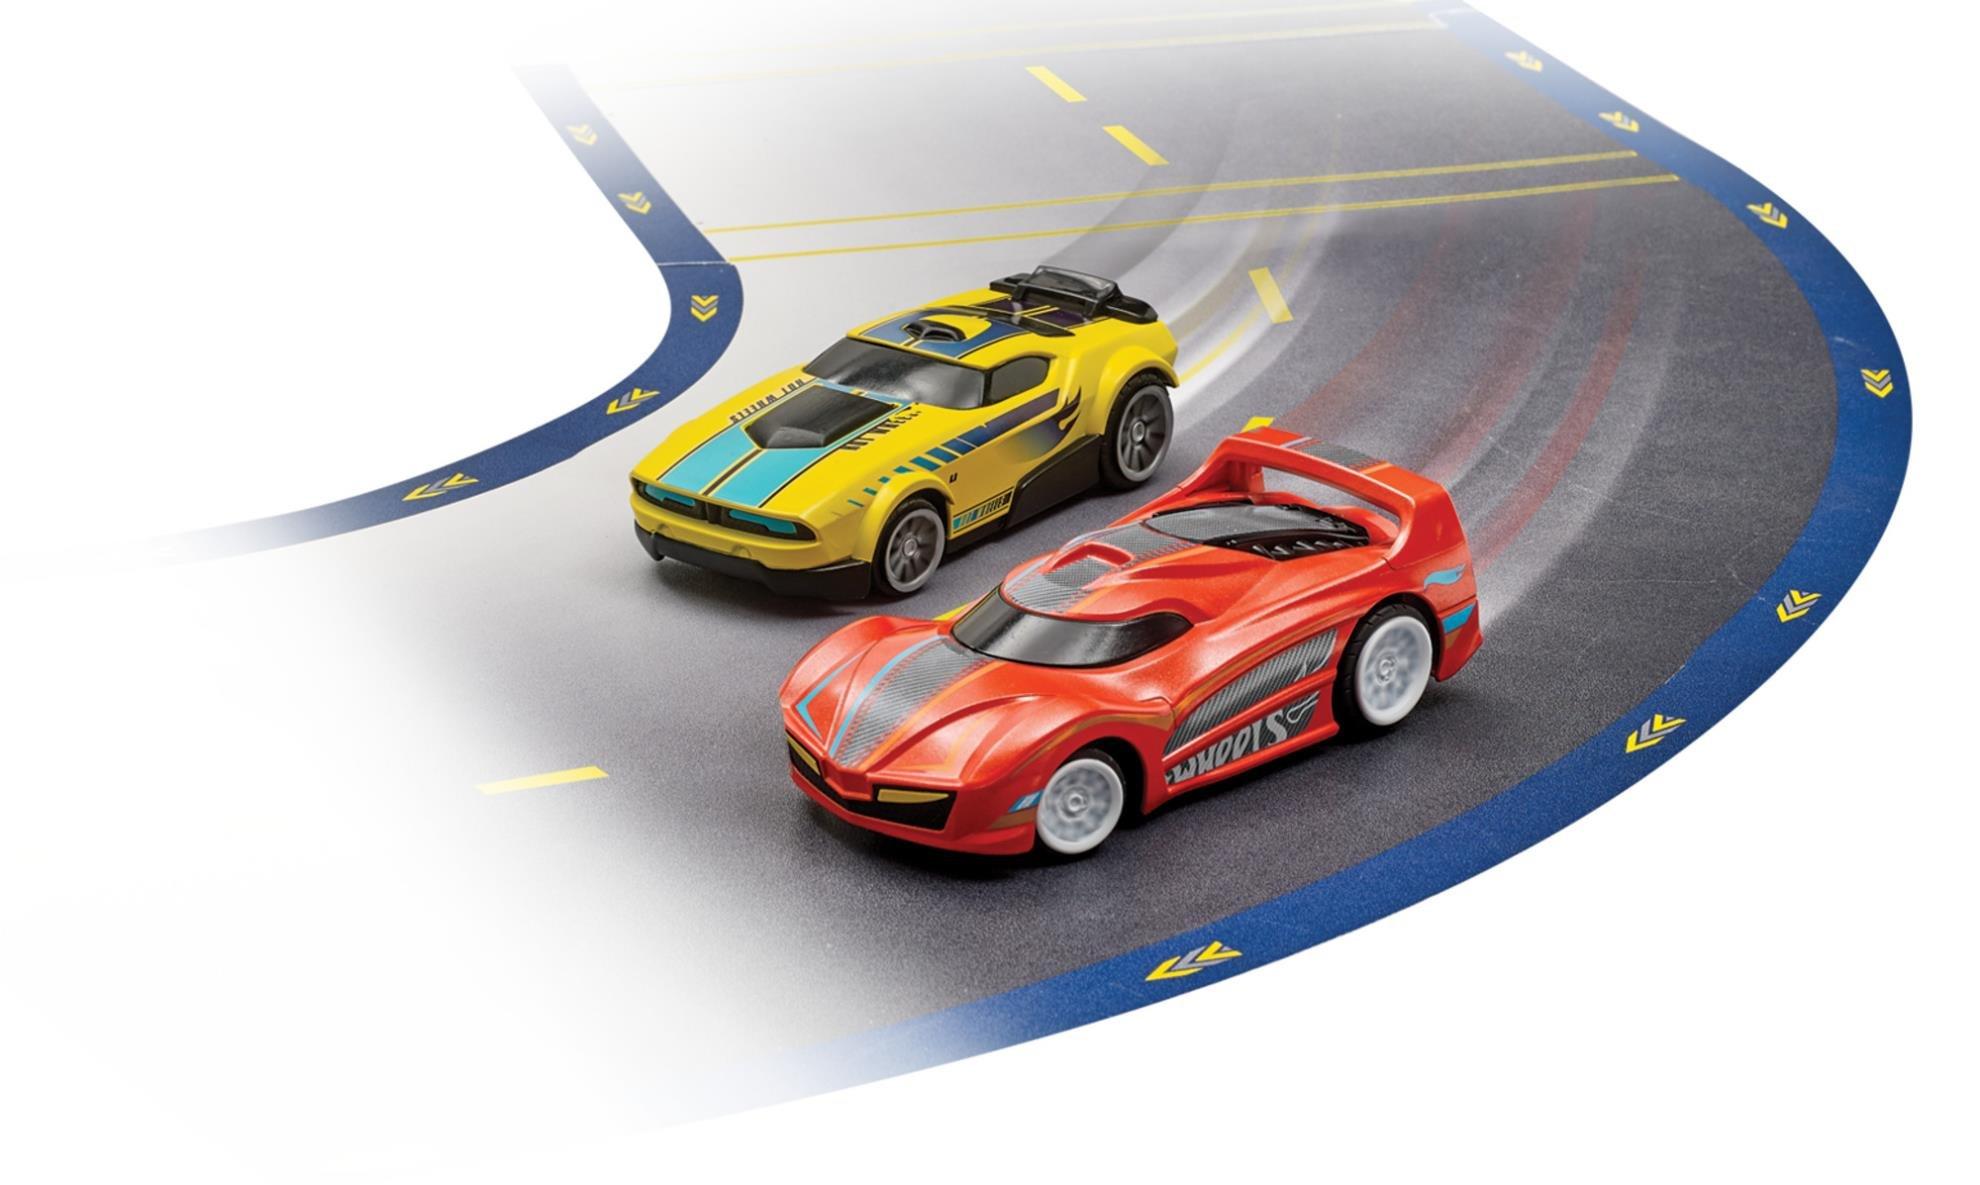 Hot Wheels Ai Starter Set Street Racing Edition by Hot Wheels (Image #5)